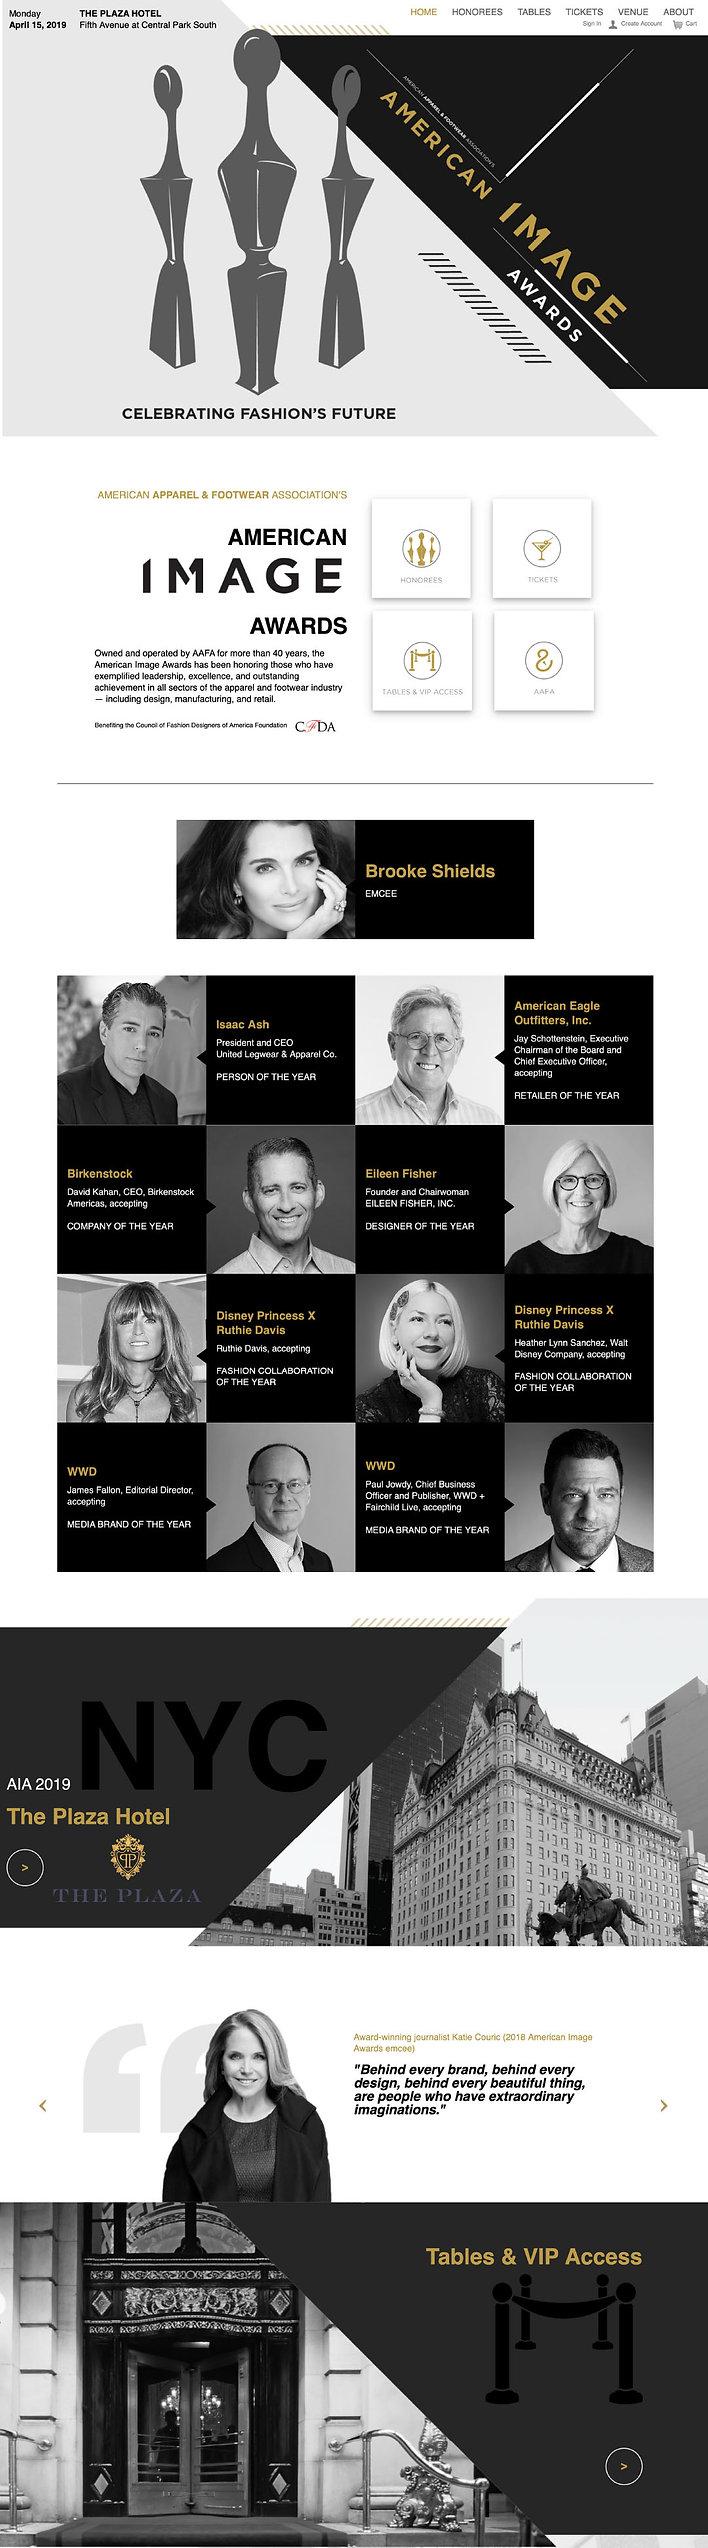 American Image Awards website design